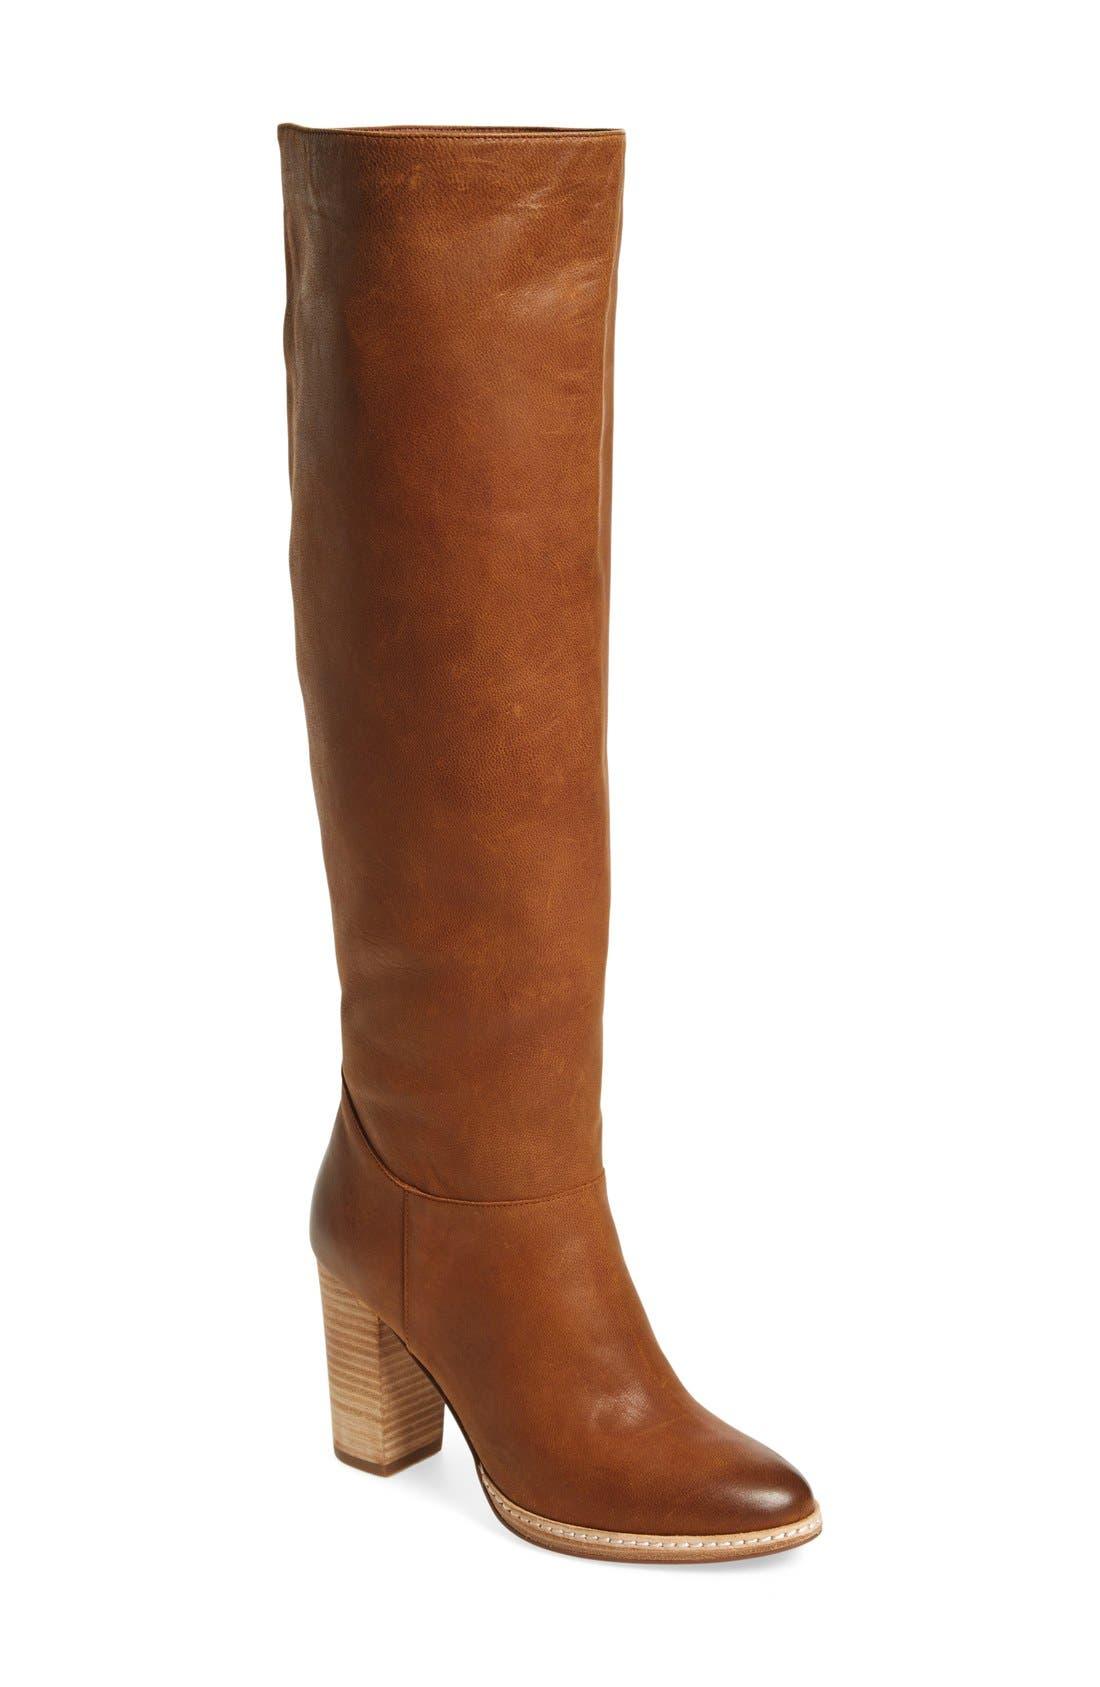 Alternate Image 1 Selected - Linea Paolo 'Kody' Tall Boot (Women)